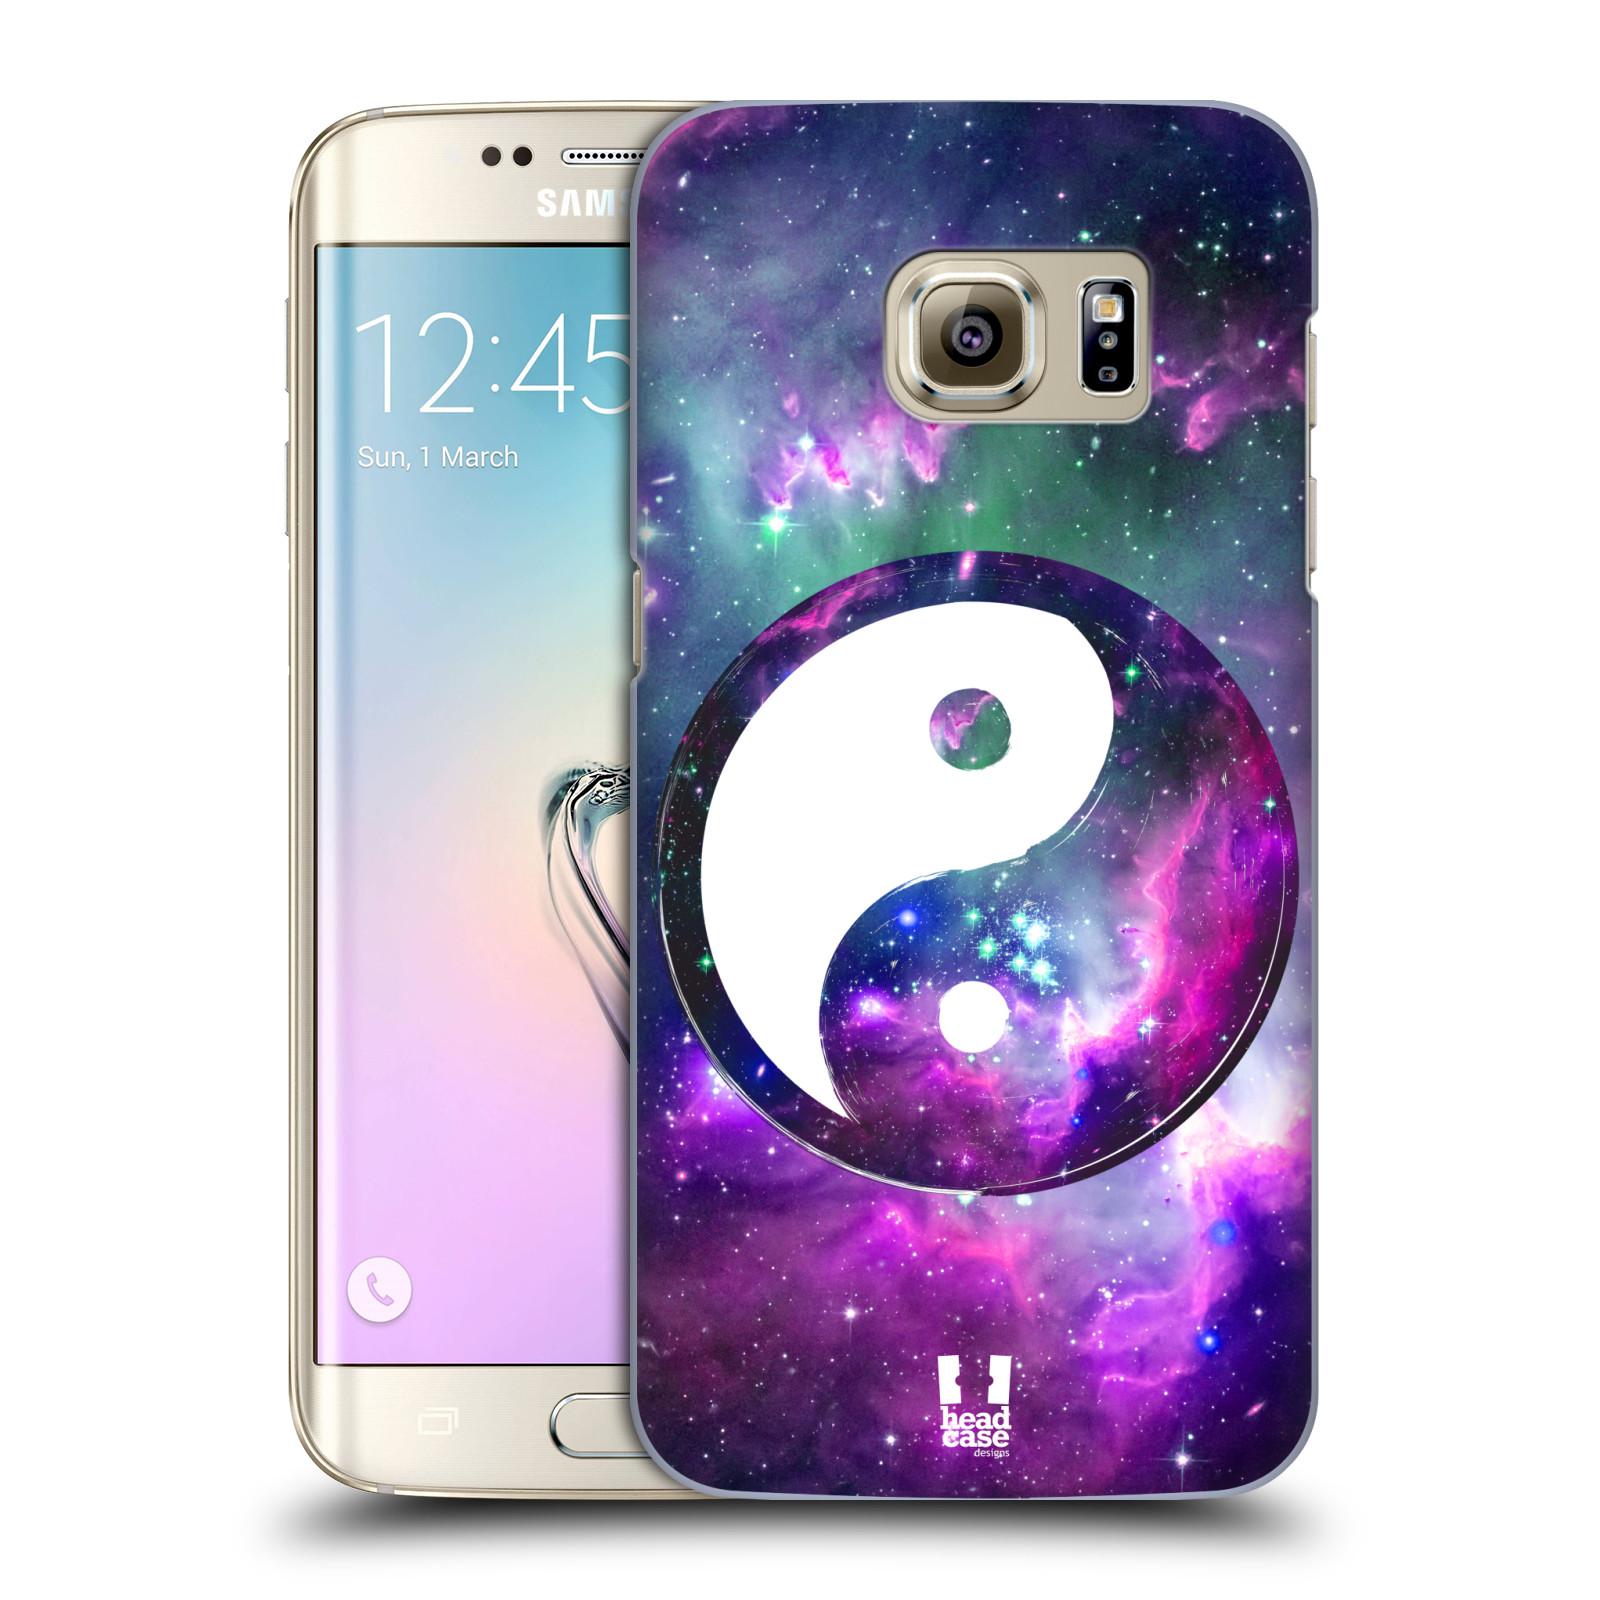 Plastové pouzdro na mobil Samsung Galaxy S7 Edge HEAD CASE Yin a Yang PURPLE (Kryt či obal na mobilní telefon Samsung Galaxy S7 Edge SM-G935F)